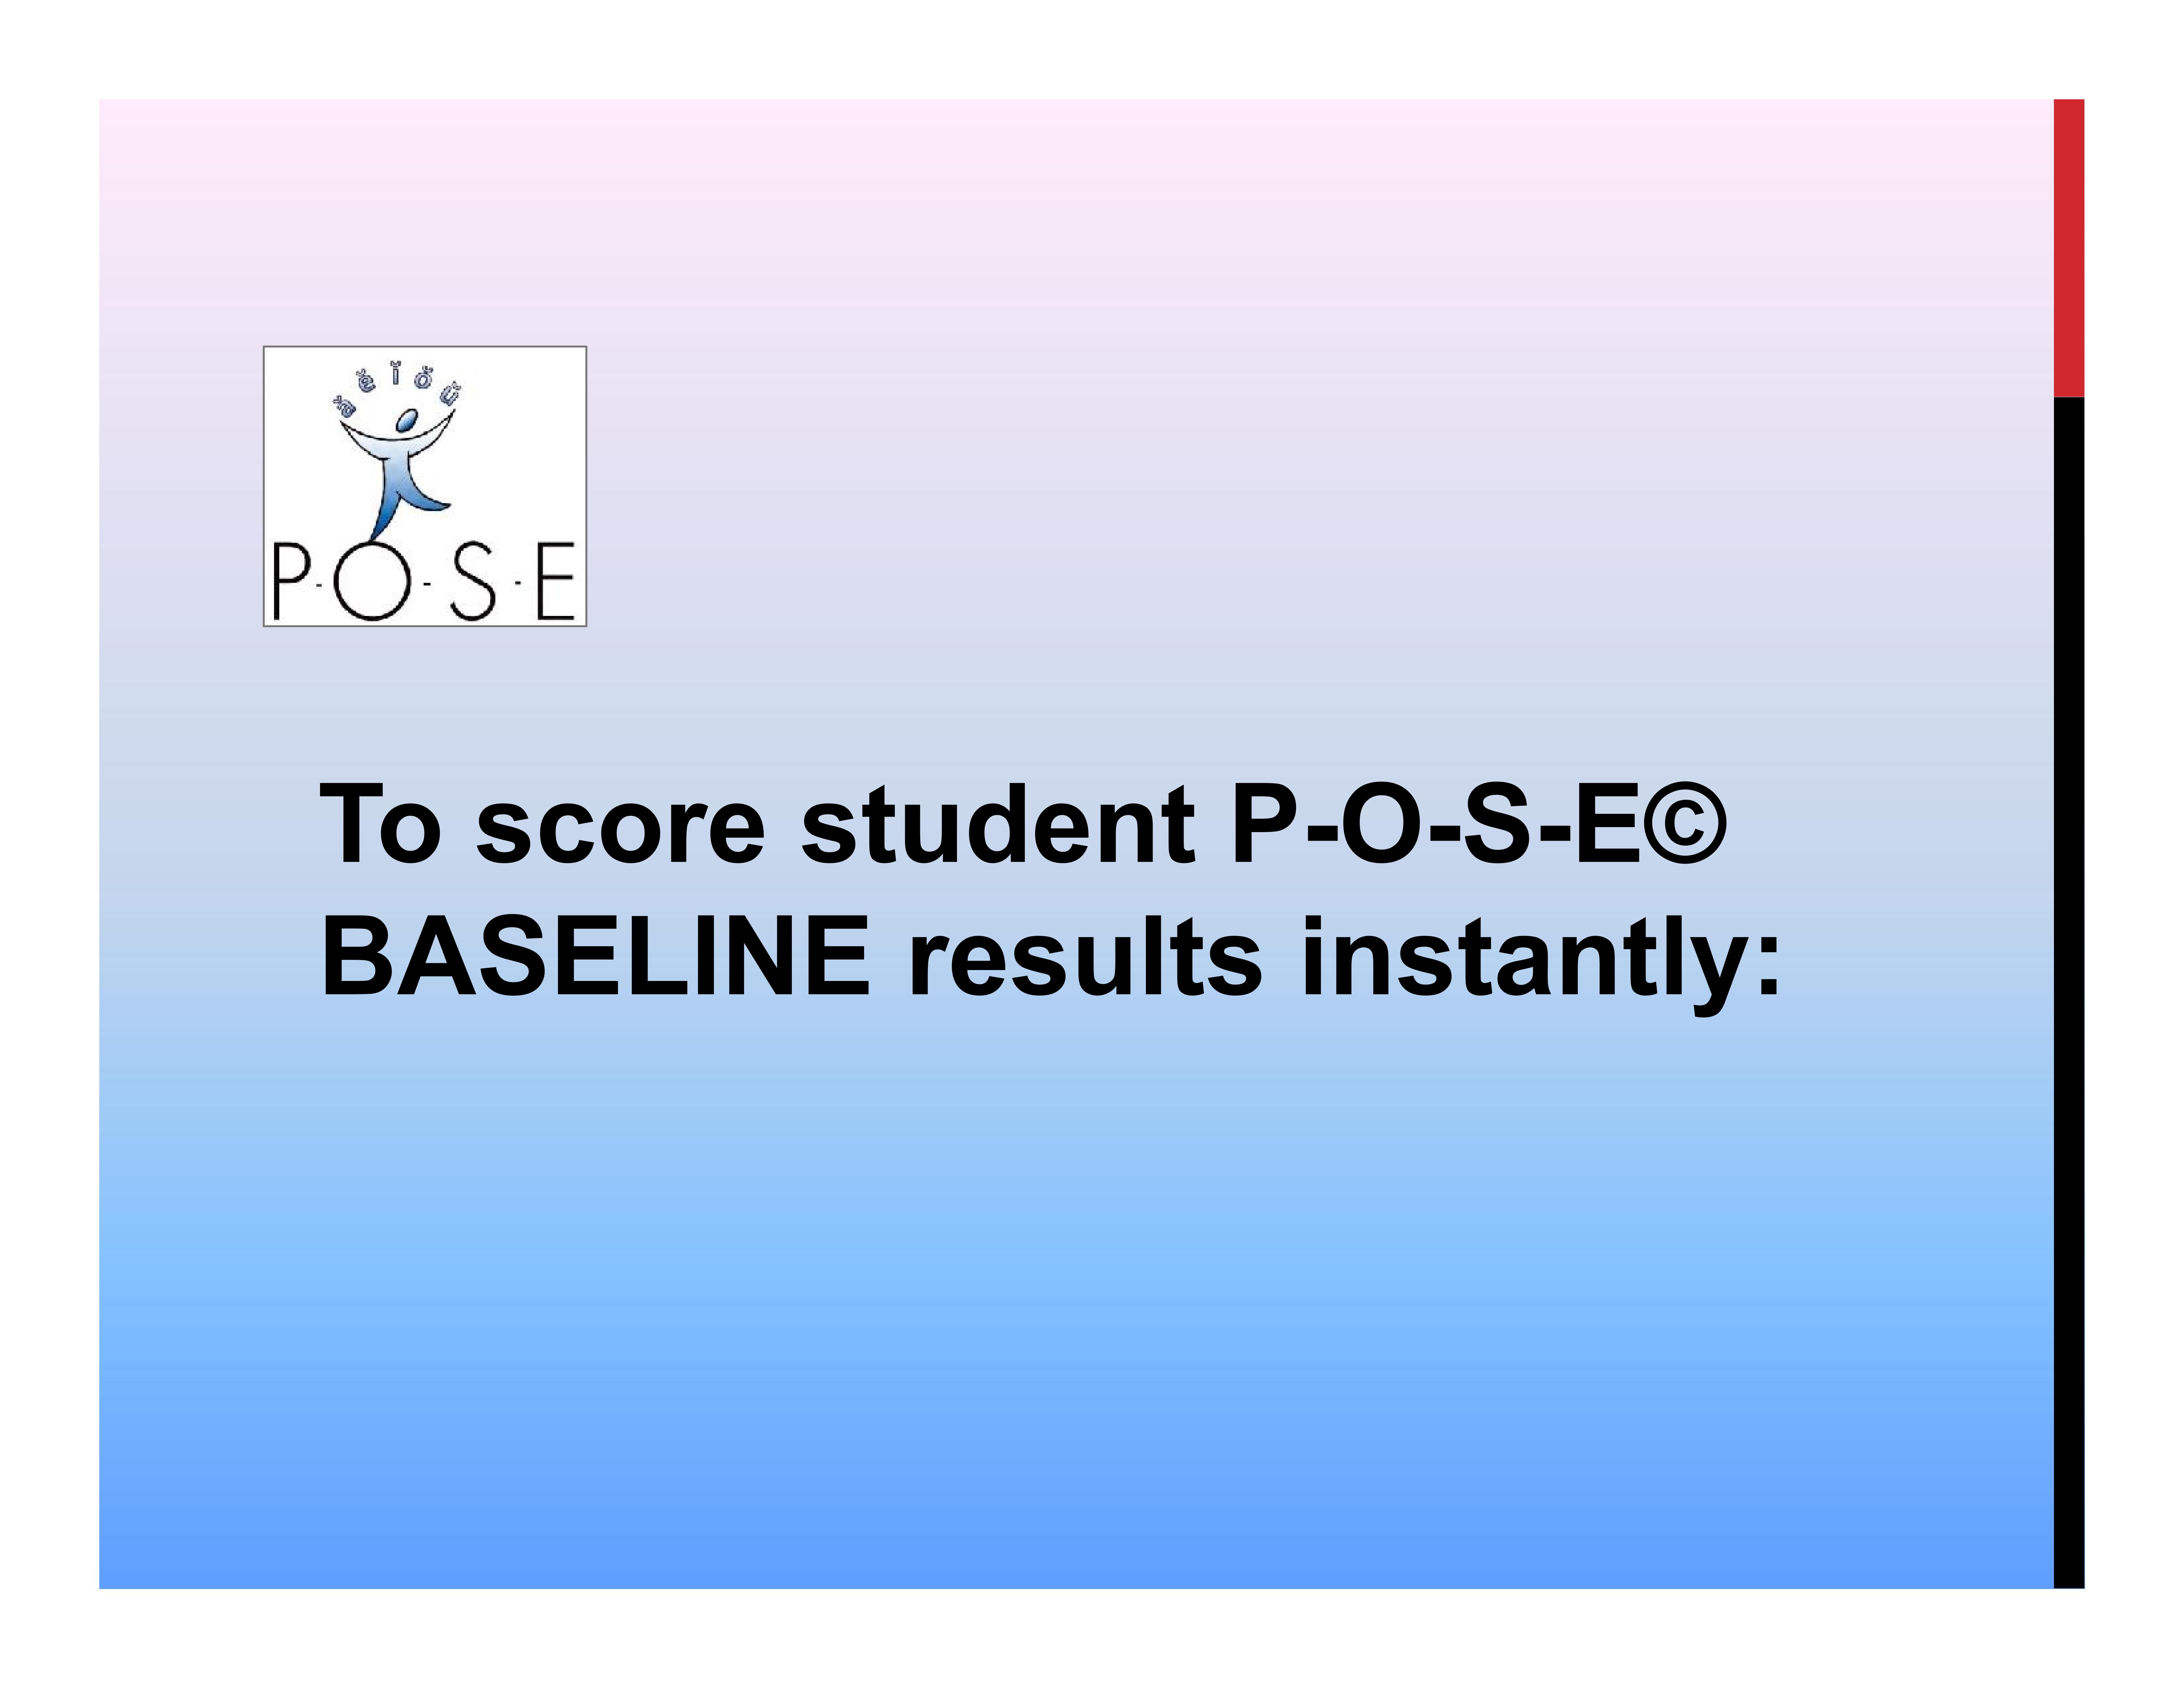 P-O-S-E literacy ELL phonology 2